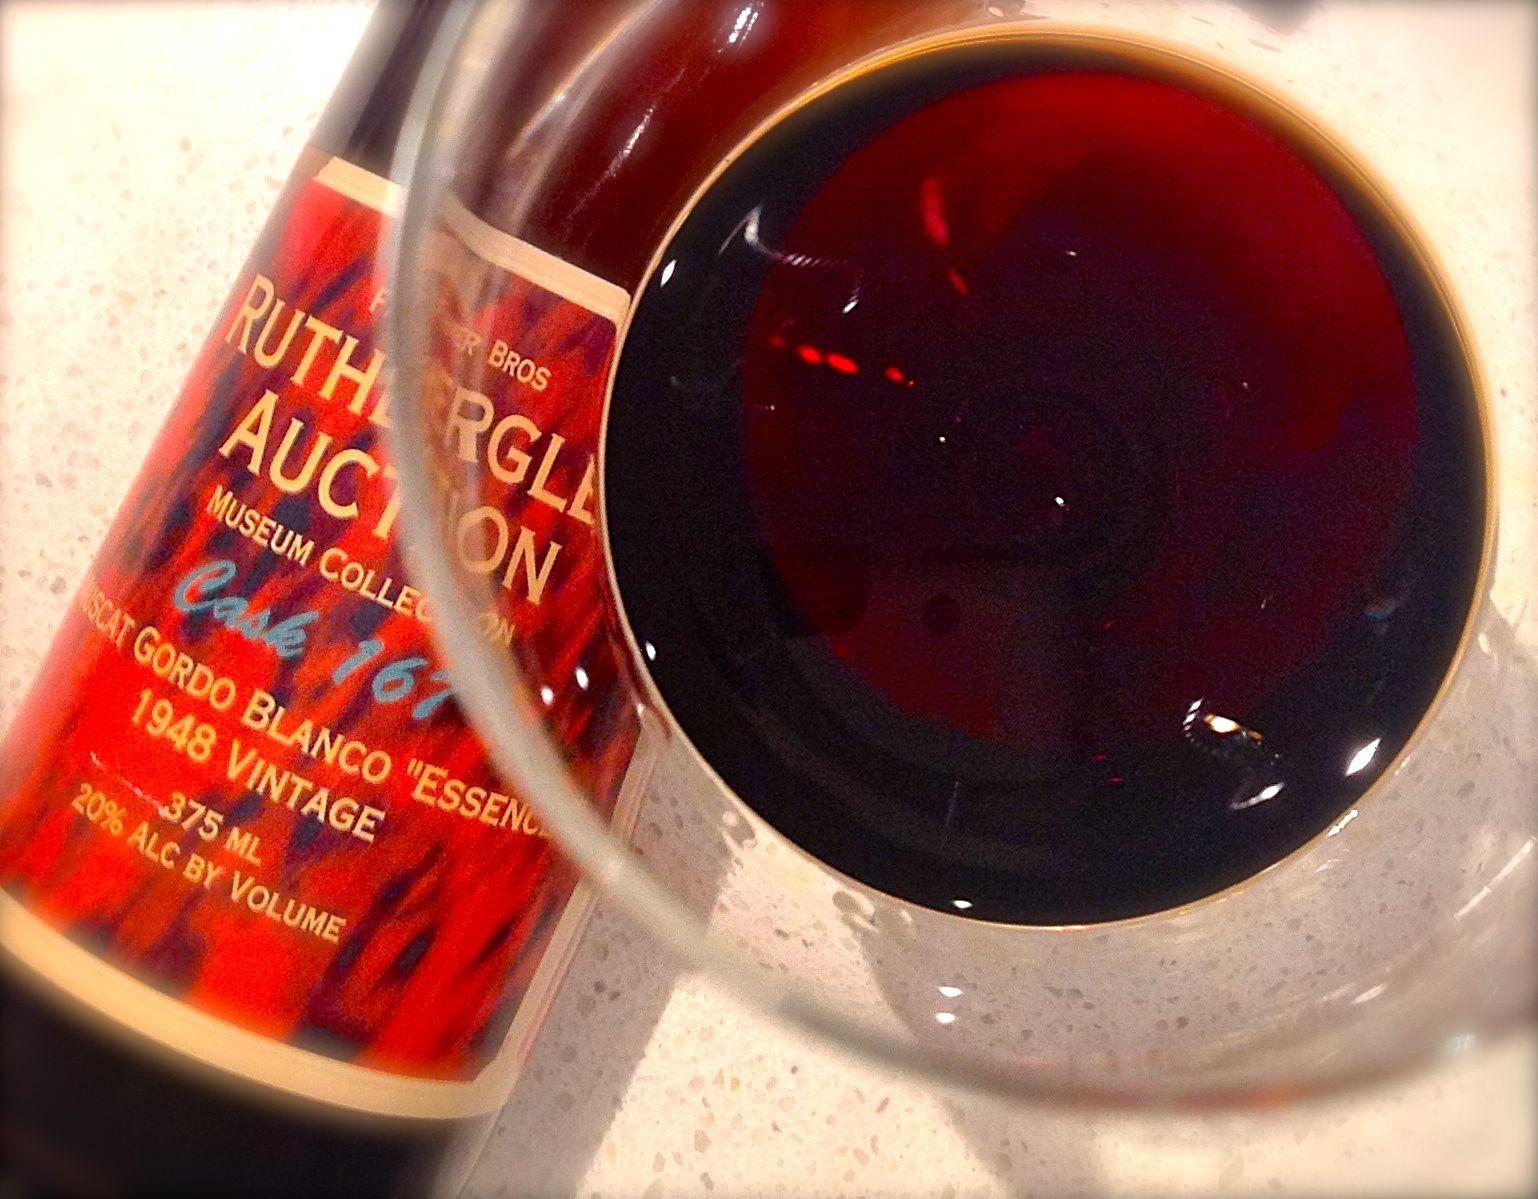 All Saints 1948 Muscat Gordo Blanco Essence Wine John Travolta Yummy